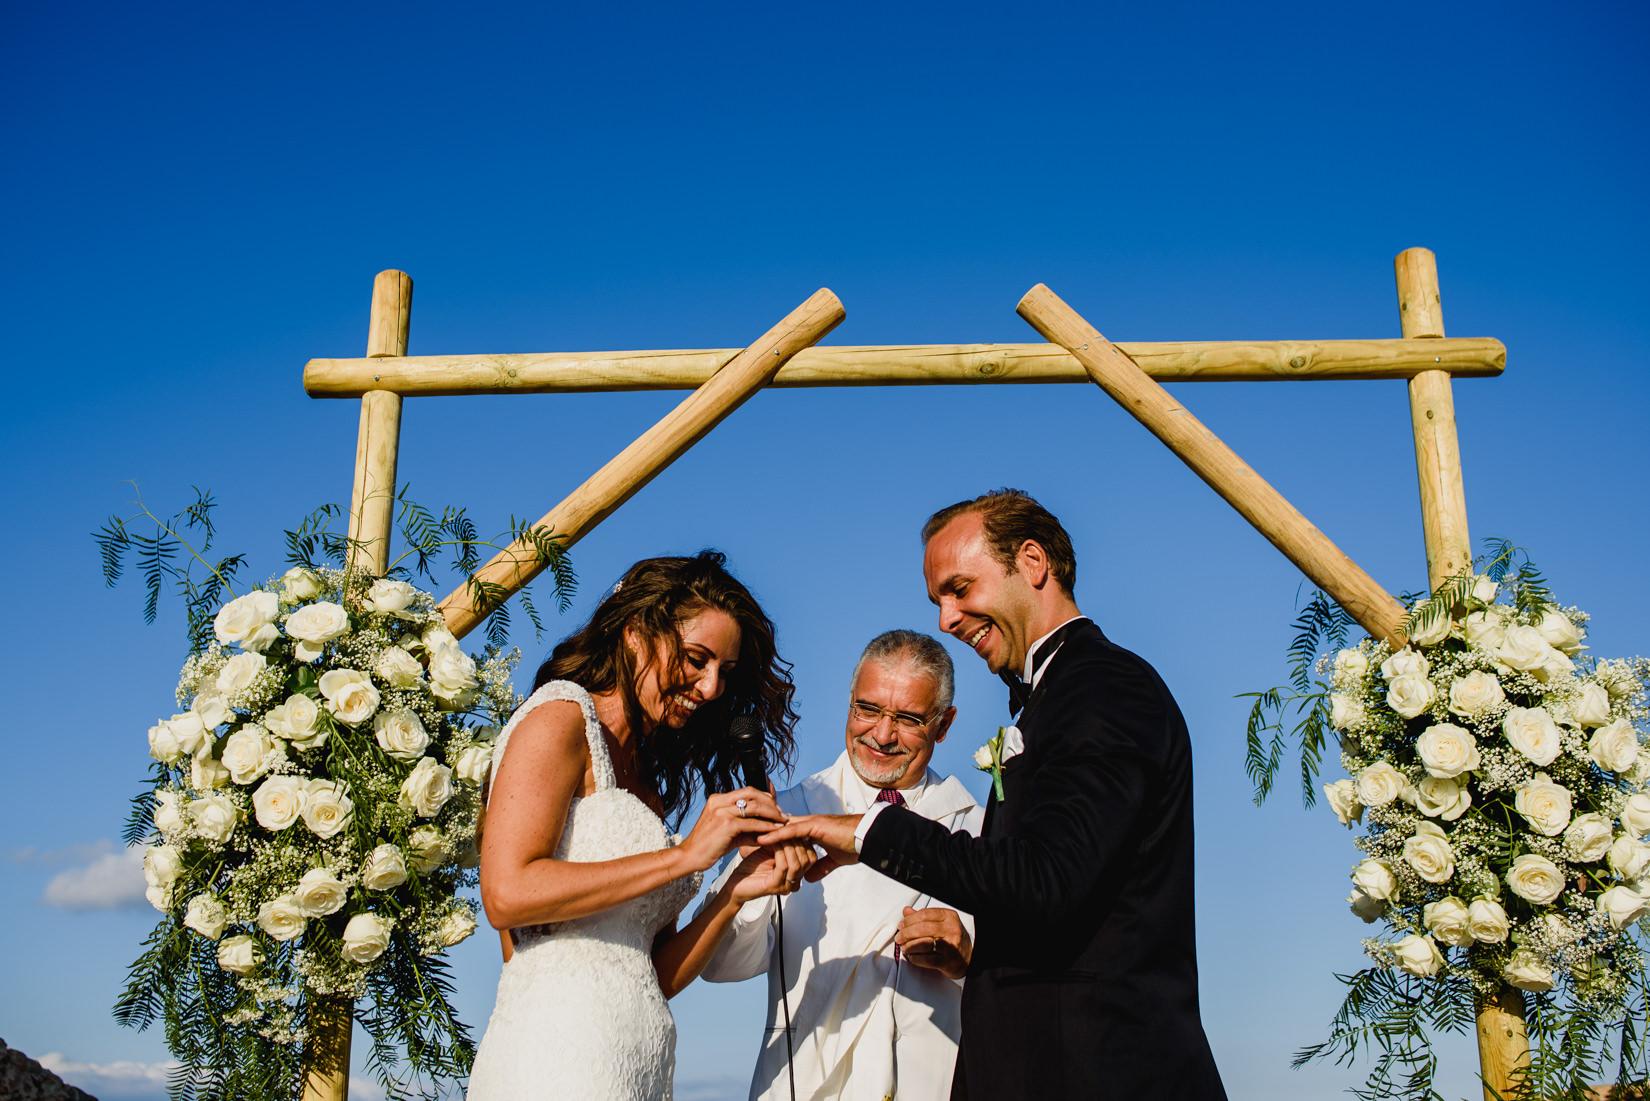 wedding-la-escollera-36.jpg